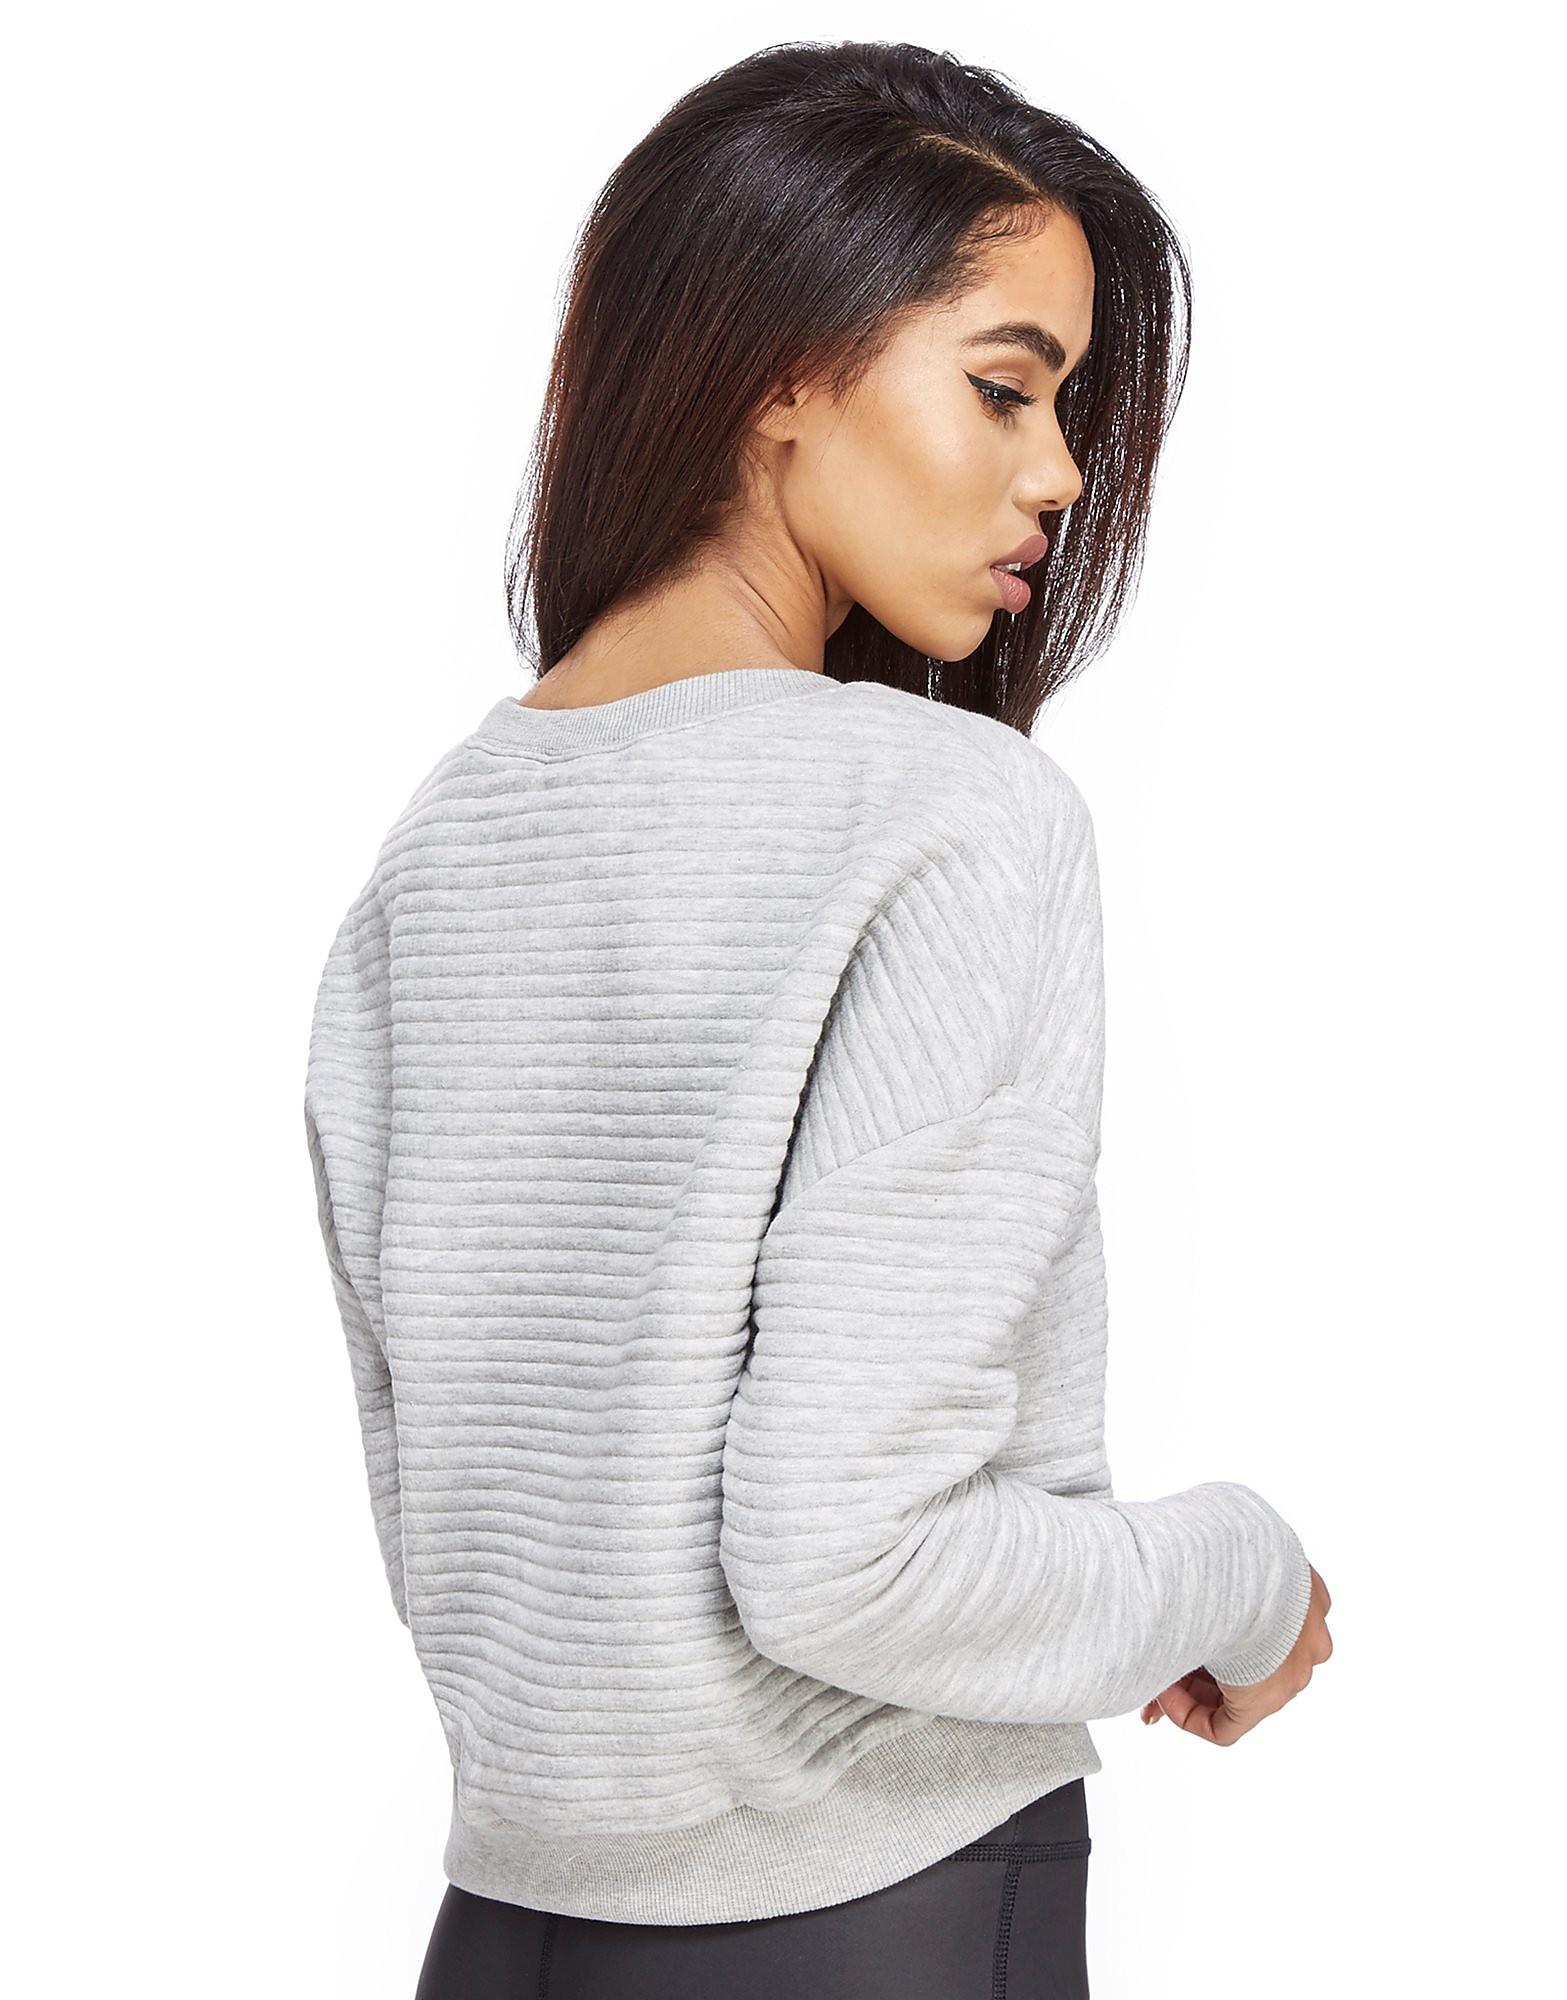 Reebok Lux Ribbed Crew Sweatshirt